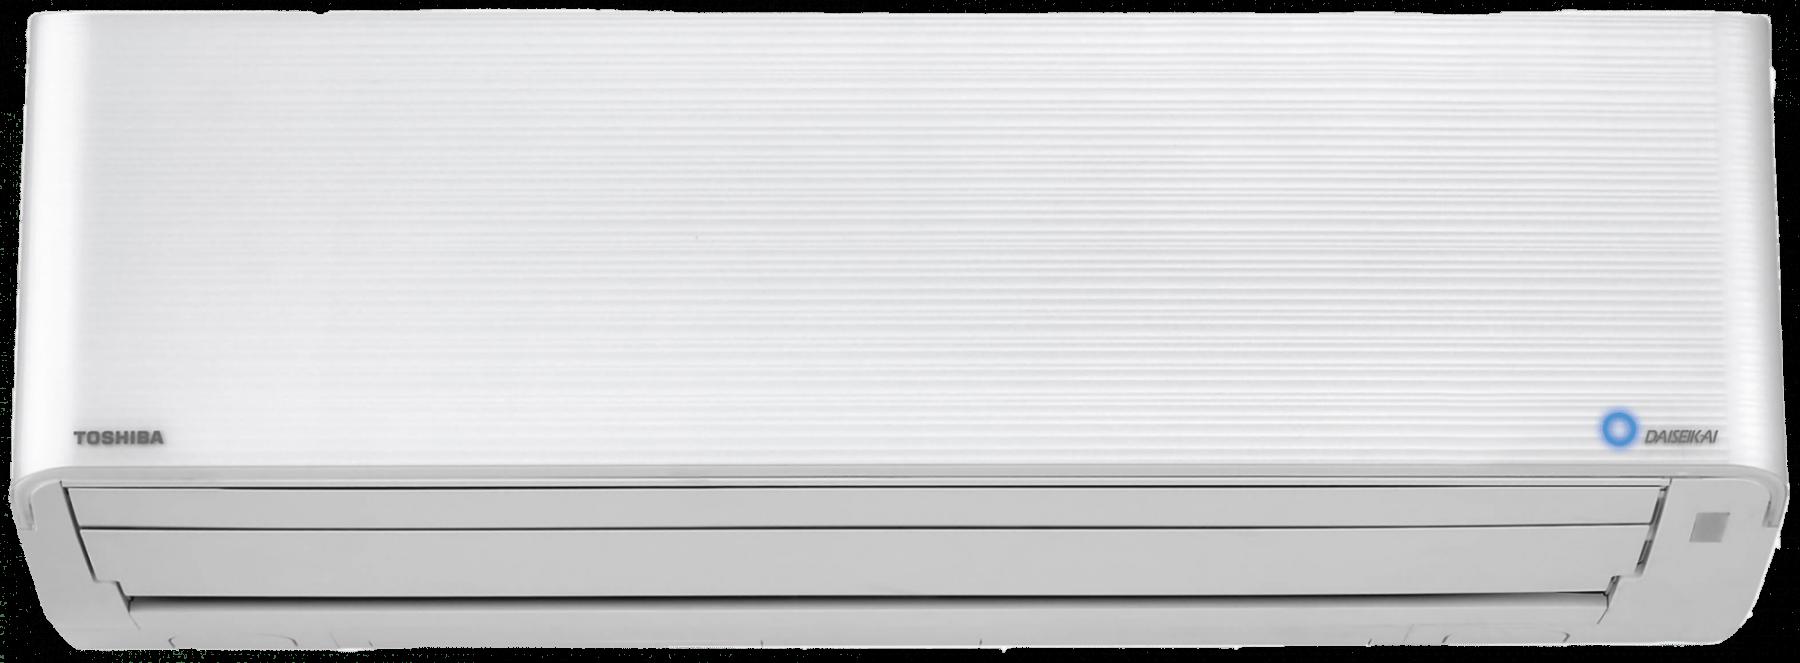 Klimatizace Toshiba Daiseikai 9 vnitřní jednotka